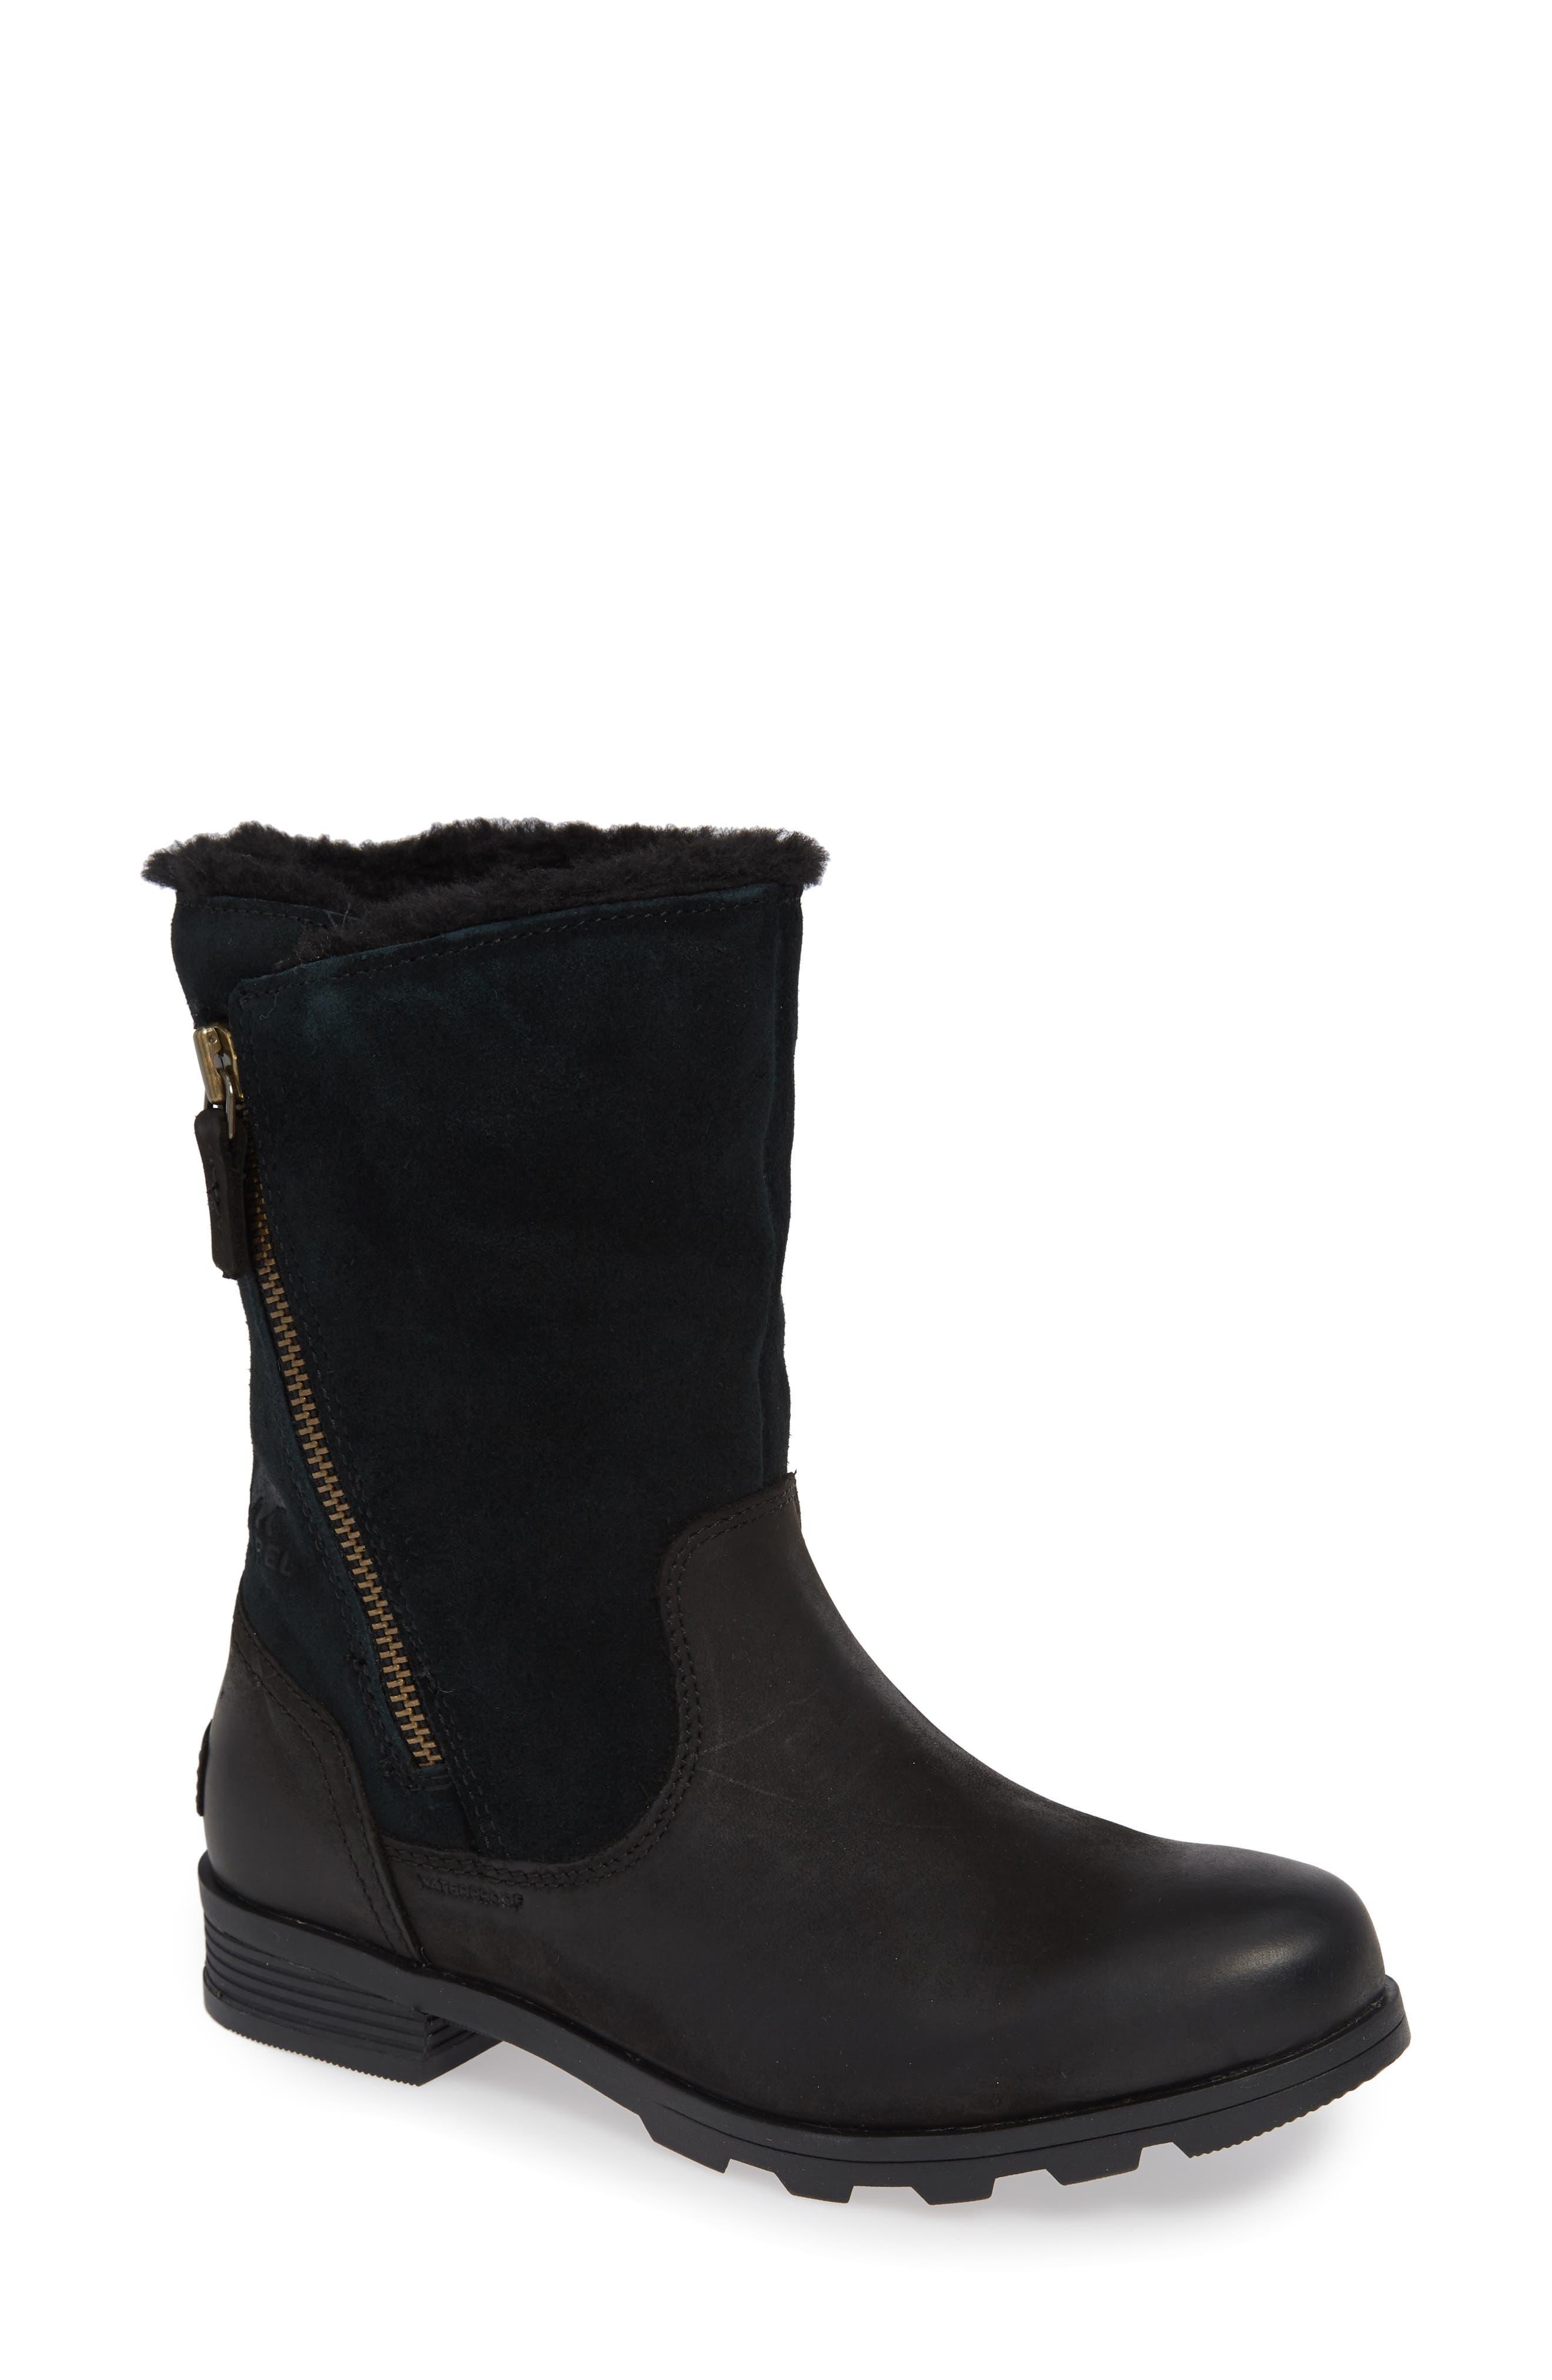 Emelie Waterproof Faux Fur Lined Boot,                         Main,                         color, BLACK